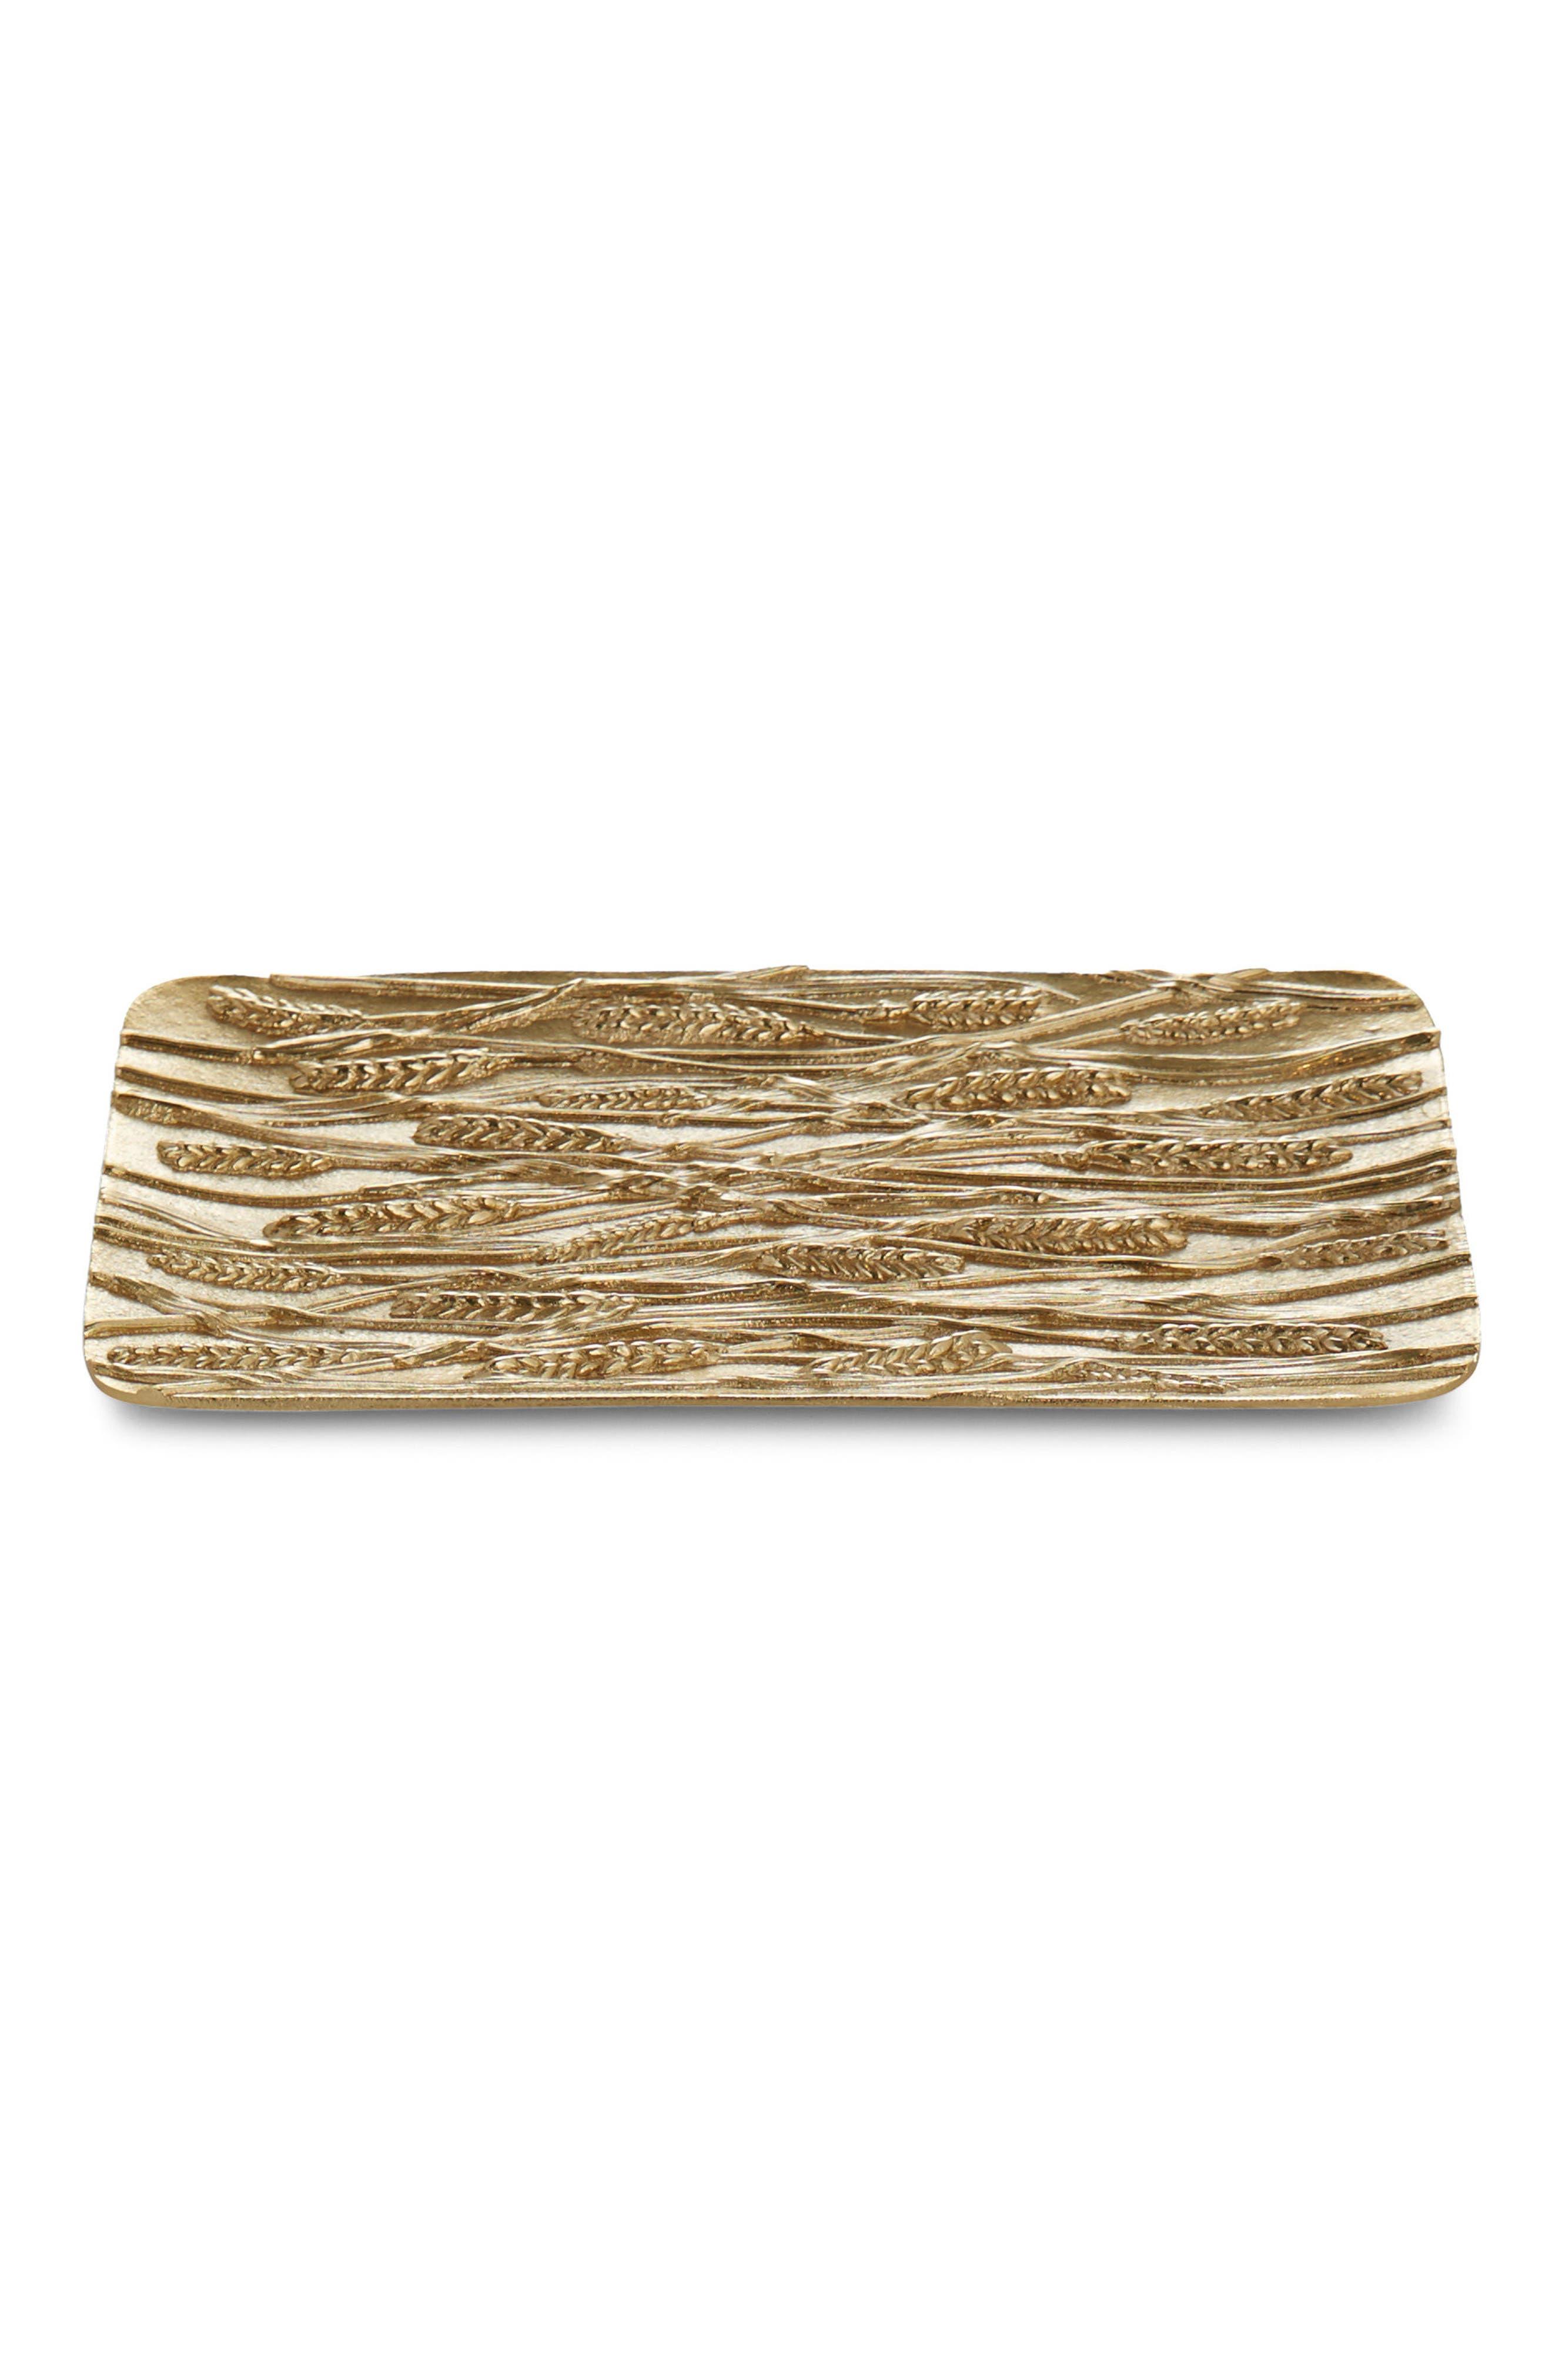 Wheat Bread Plate,                         Main,                         color, Gold